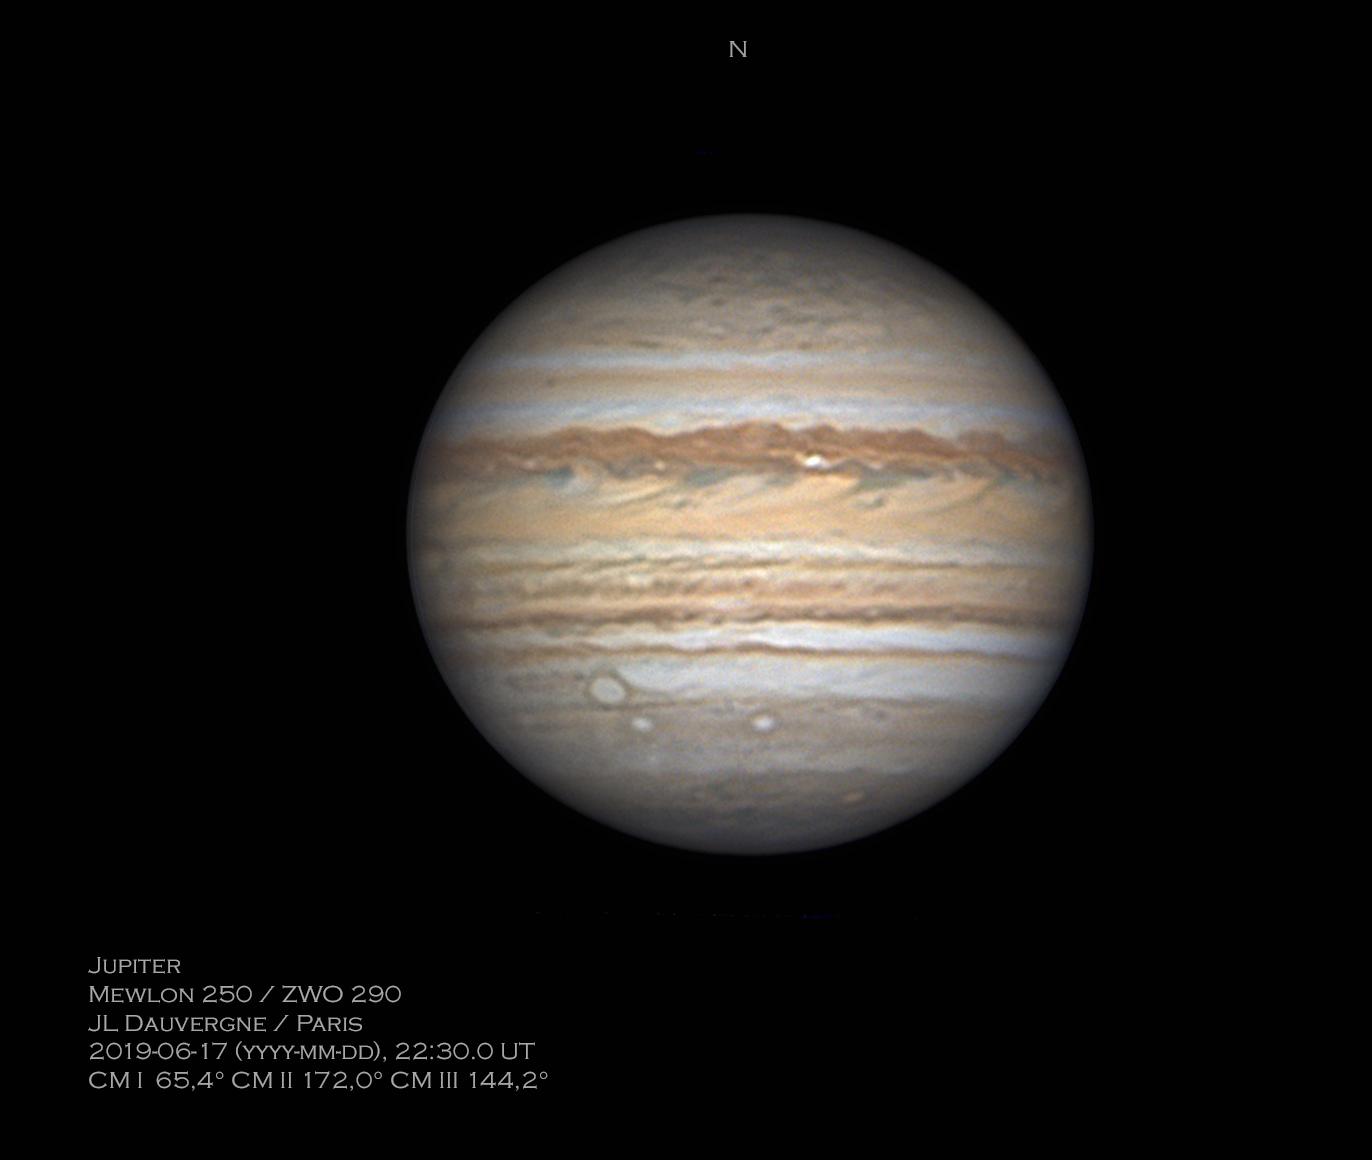 5d13df245ba20_2019-06-17-2230_0-L-Jupiter_ZWOASI290MMMini_lapl6_ap200copie.jpg.662437d77d5eeb1191461c0dff89a27d.jpg